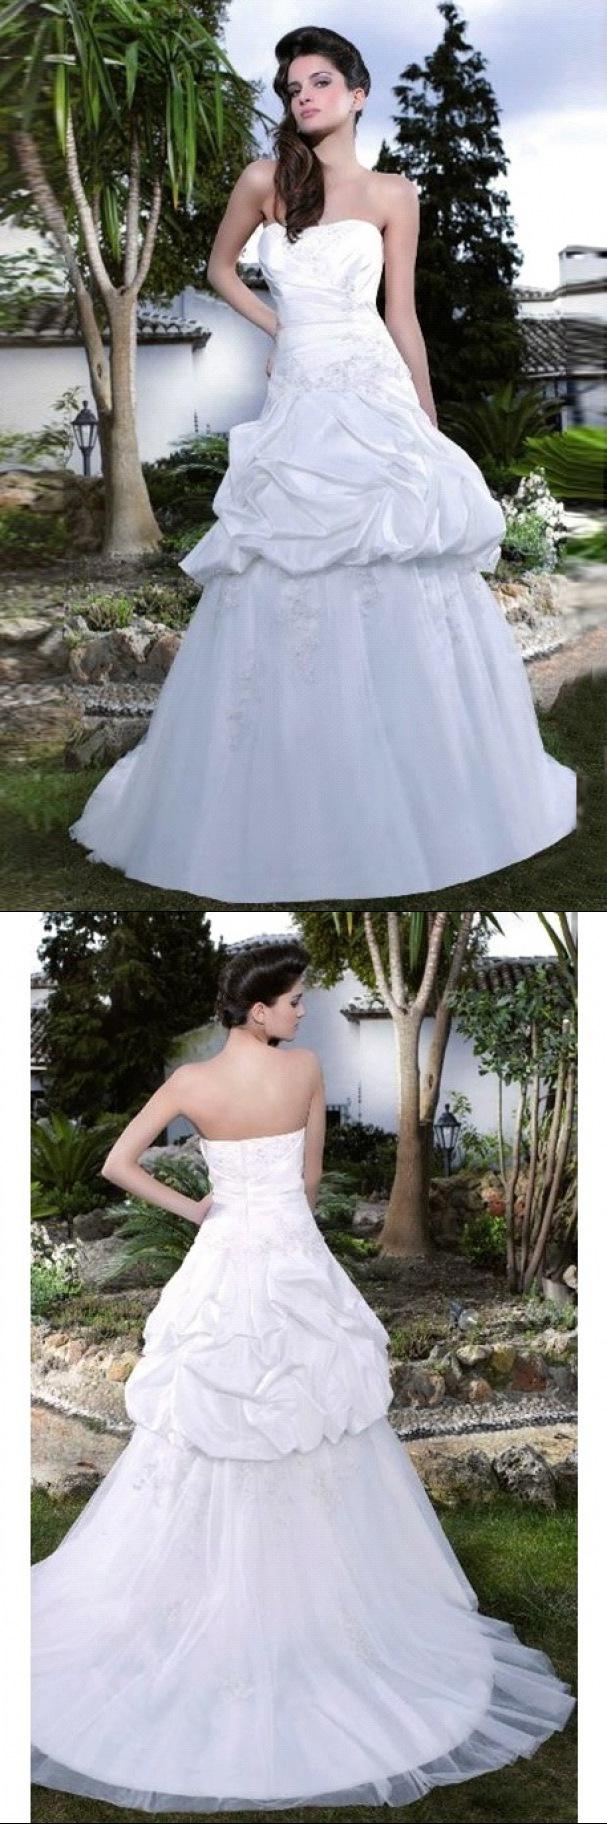 Clothe custommade wedding dress wedding gown reception dresses